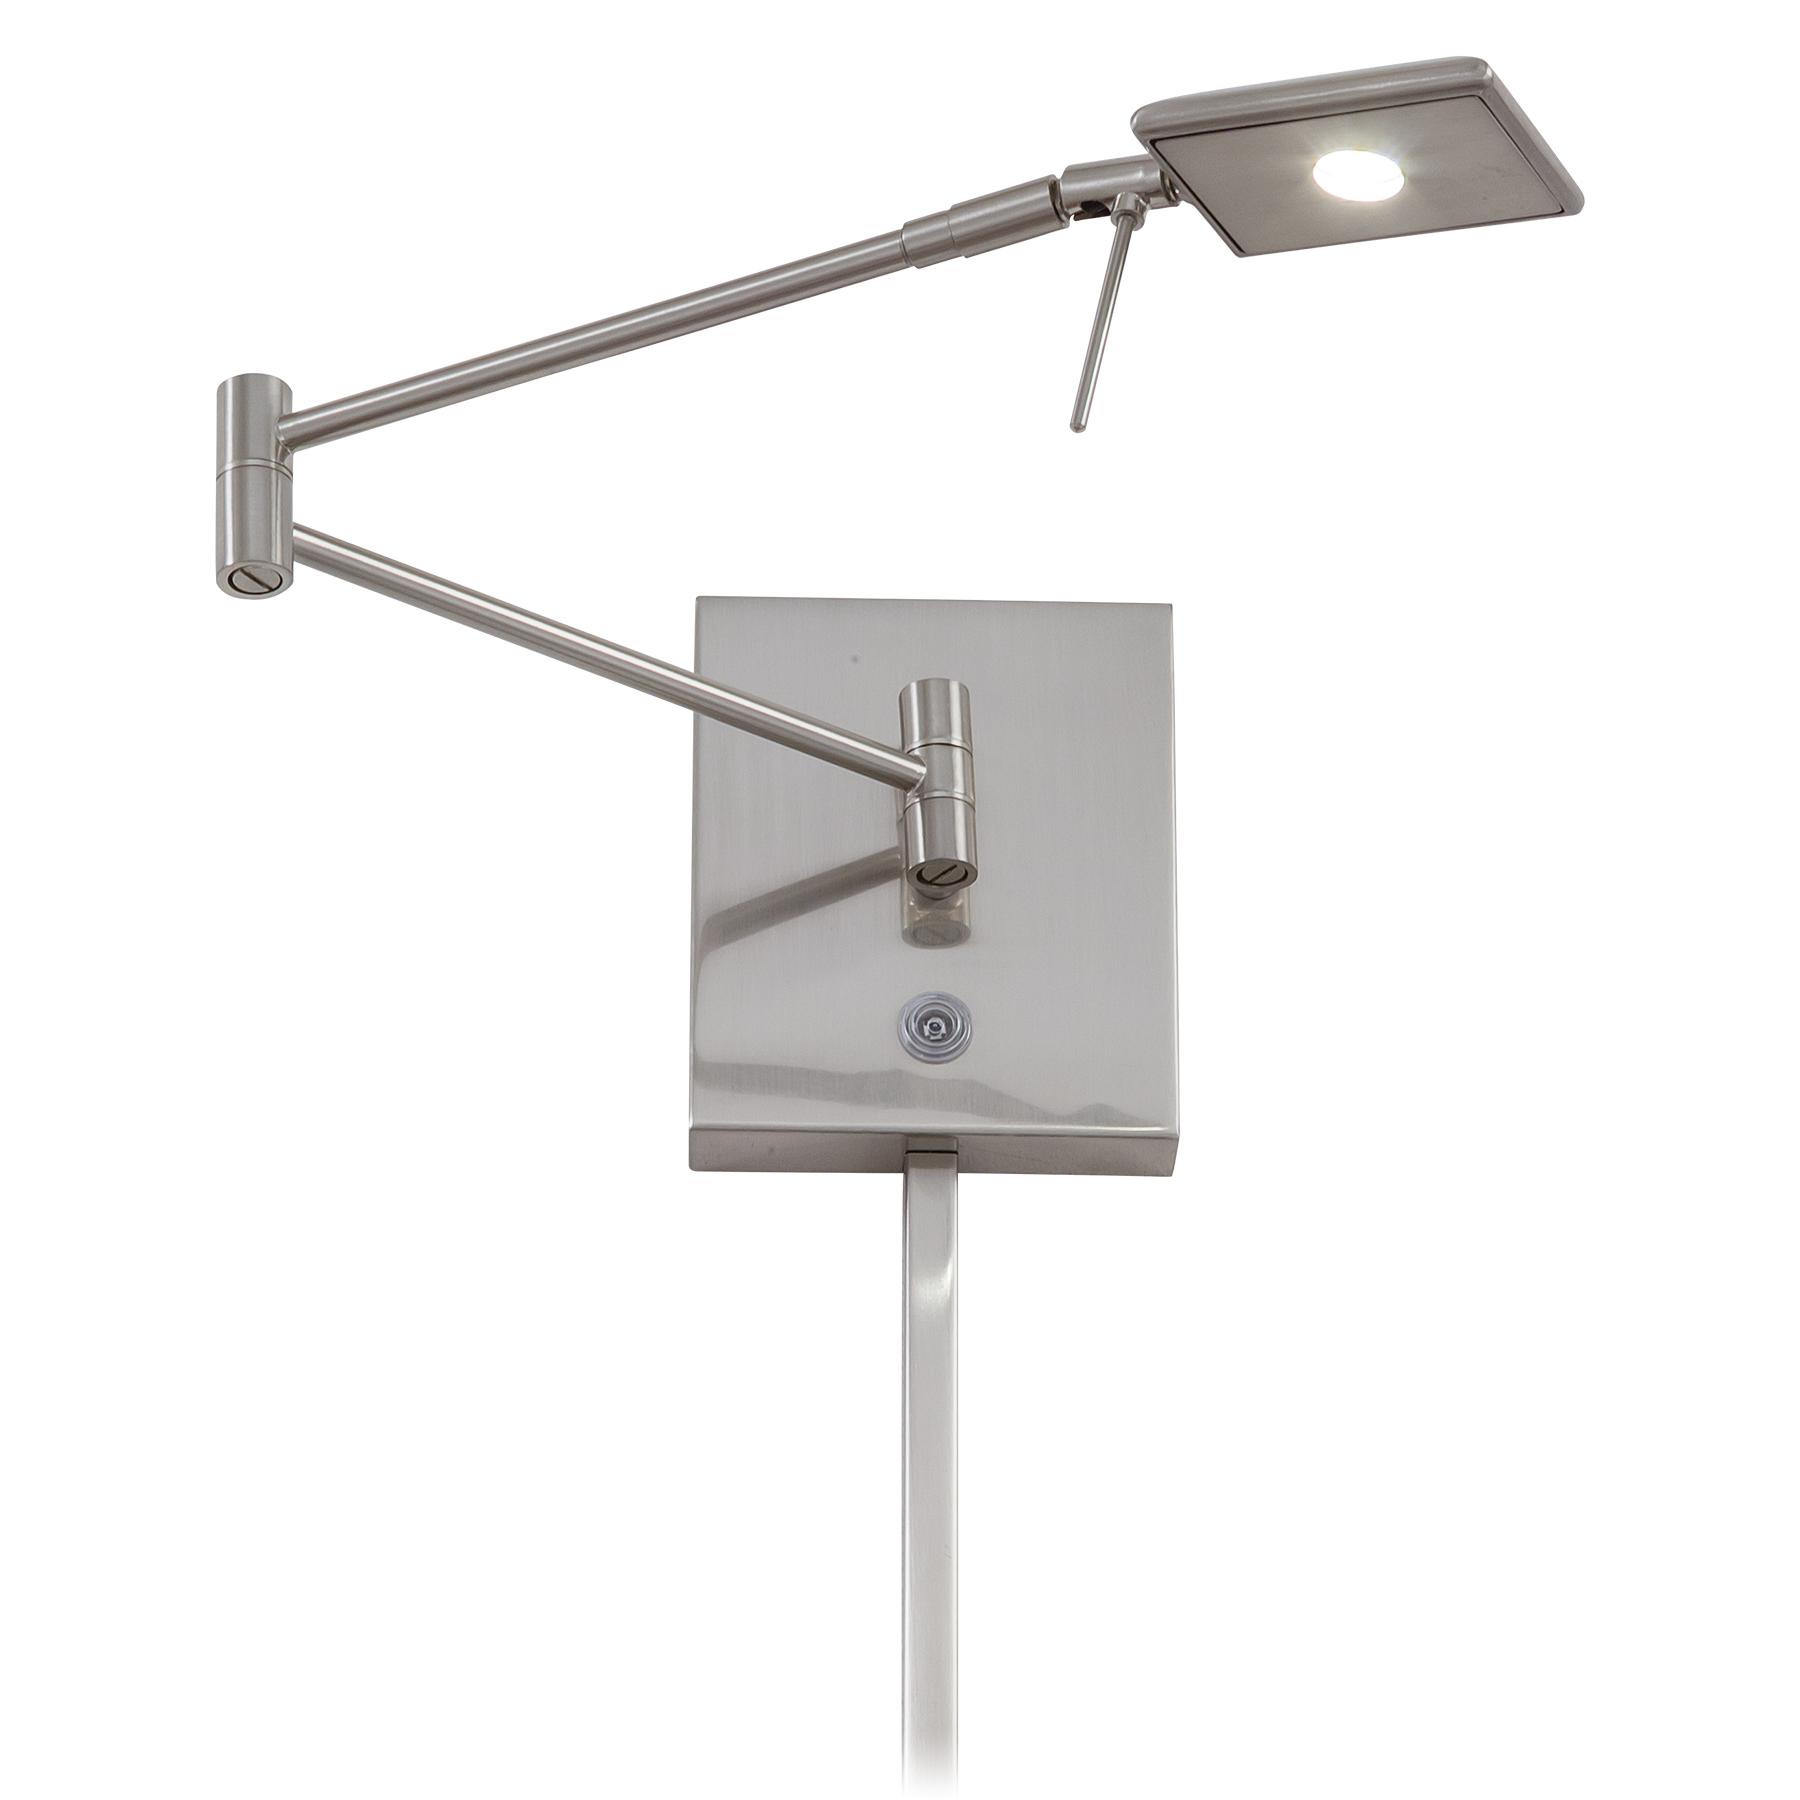 Minka Group Brands George Kovacsreg P4328 084 Sconce Lamp Wiring Diagram Image With No Description